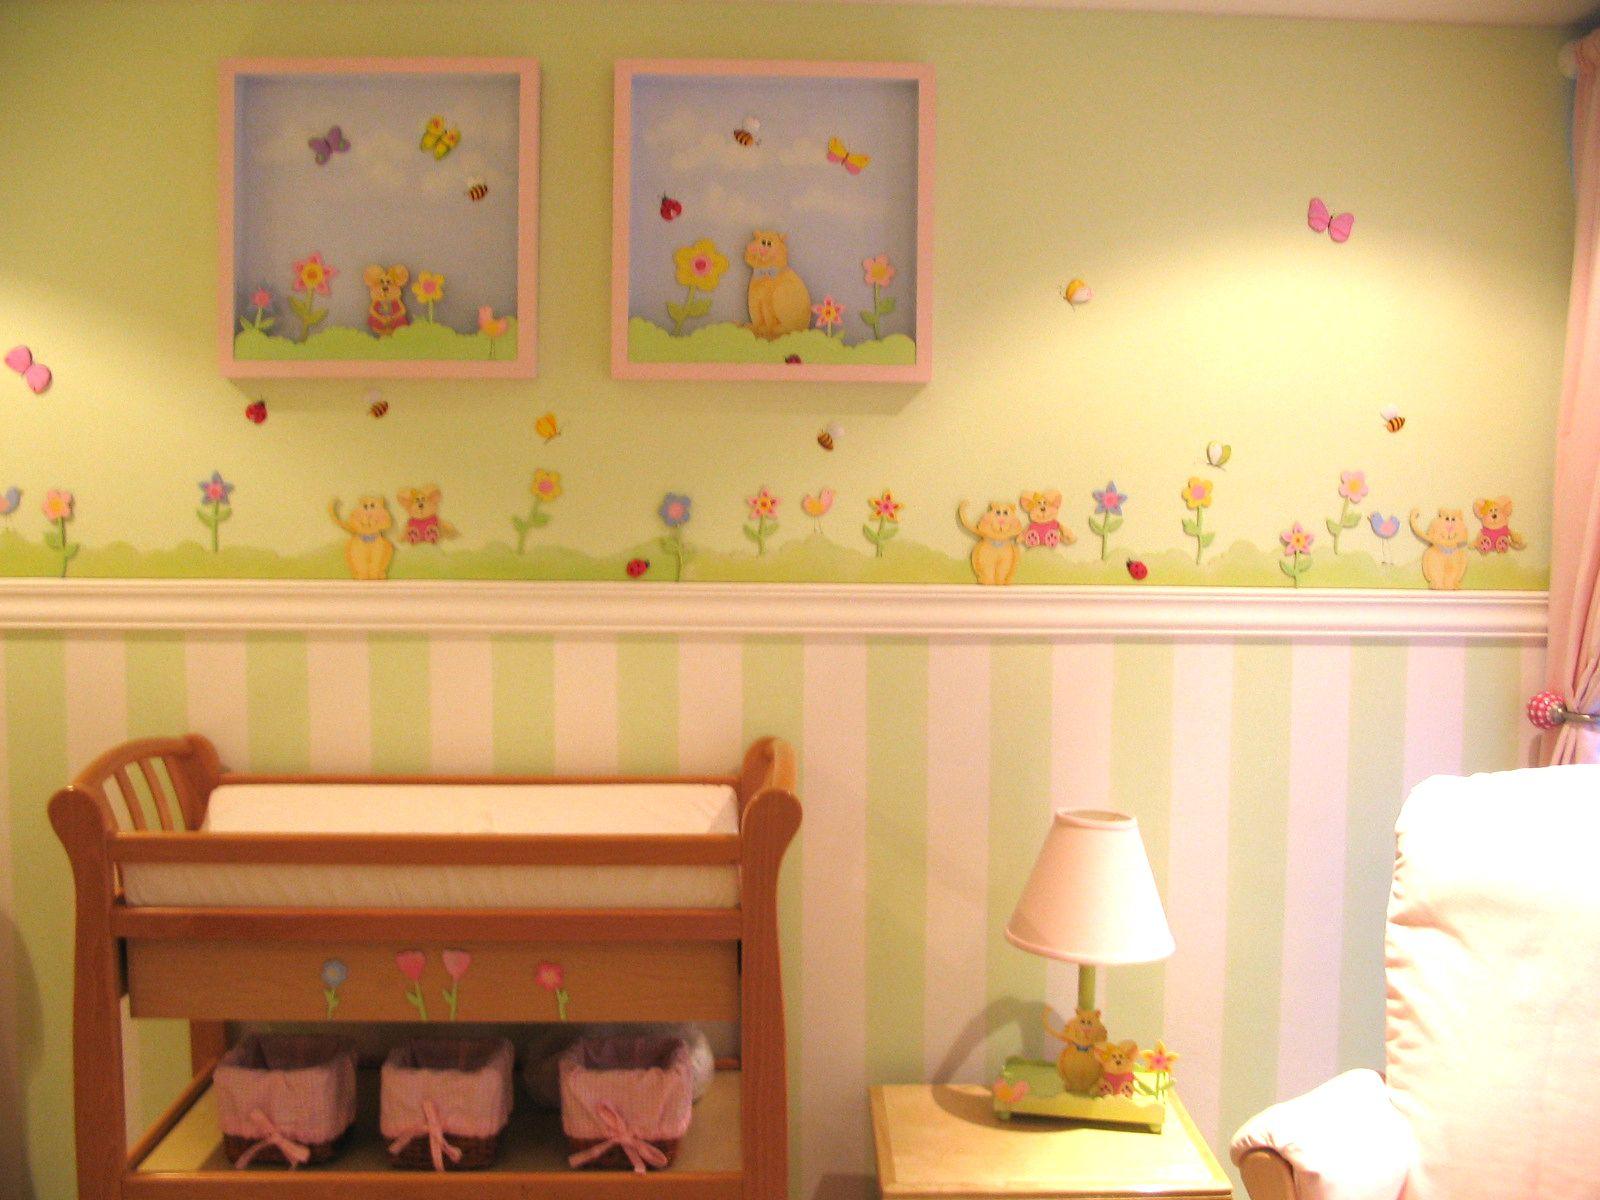 Cuarto BEBE | MURALS BY: ADRIANA ESCOBAR | Pinterest | Babies and ...